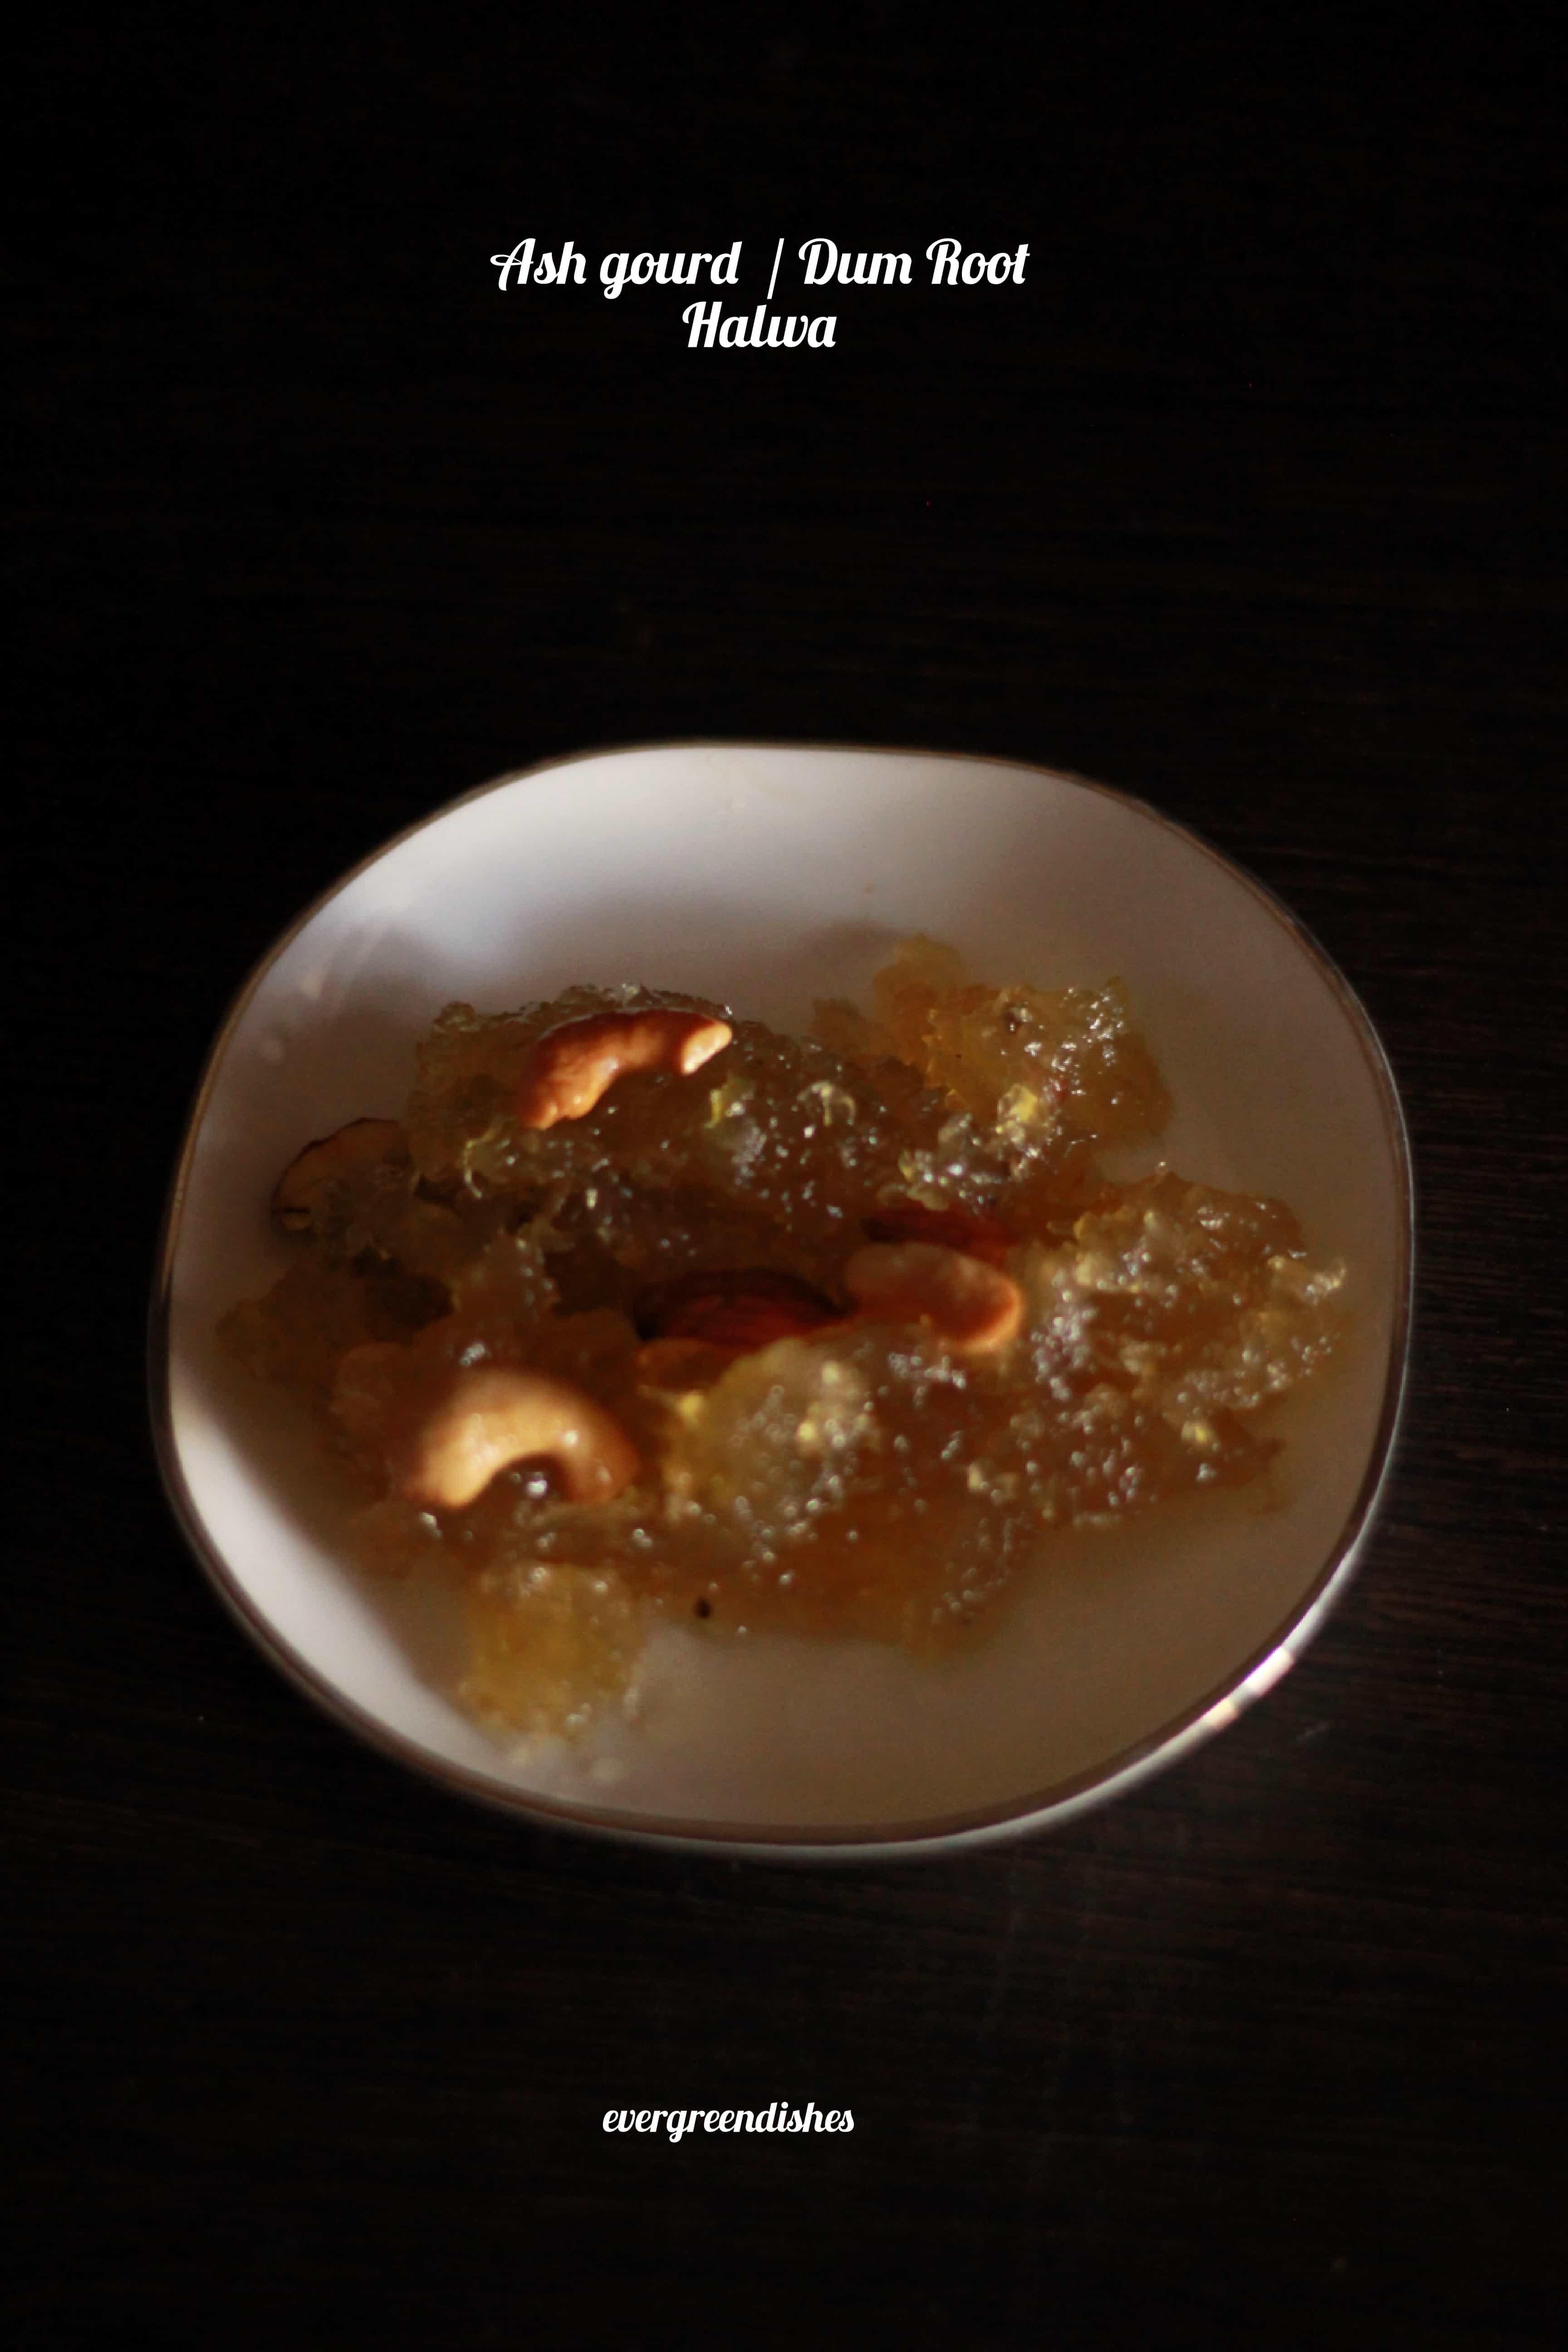 Ash gourd halwa / dum root halwa